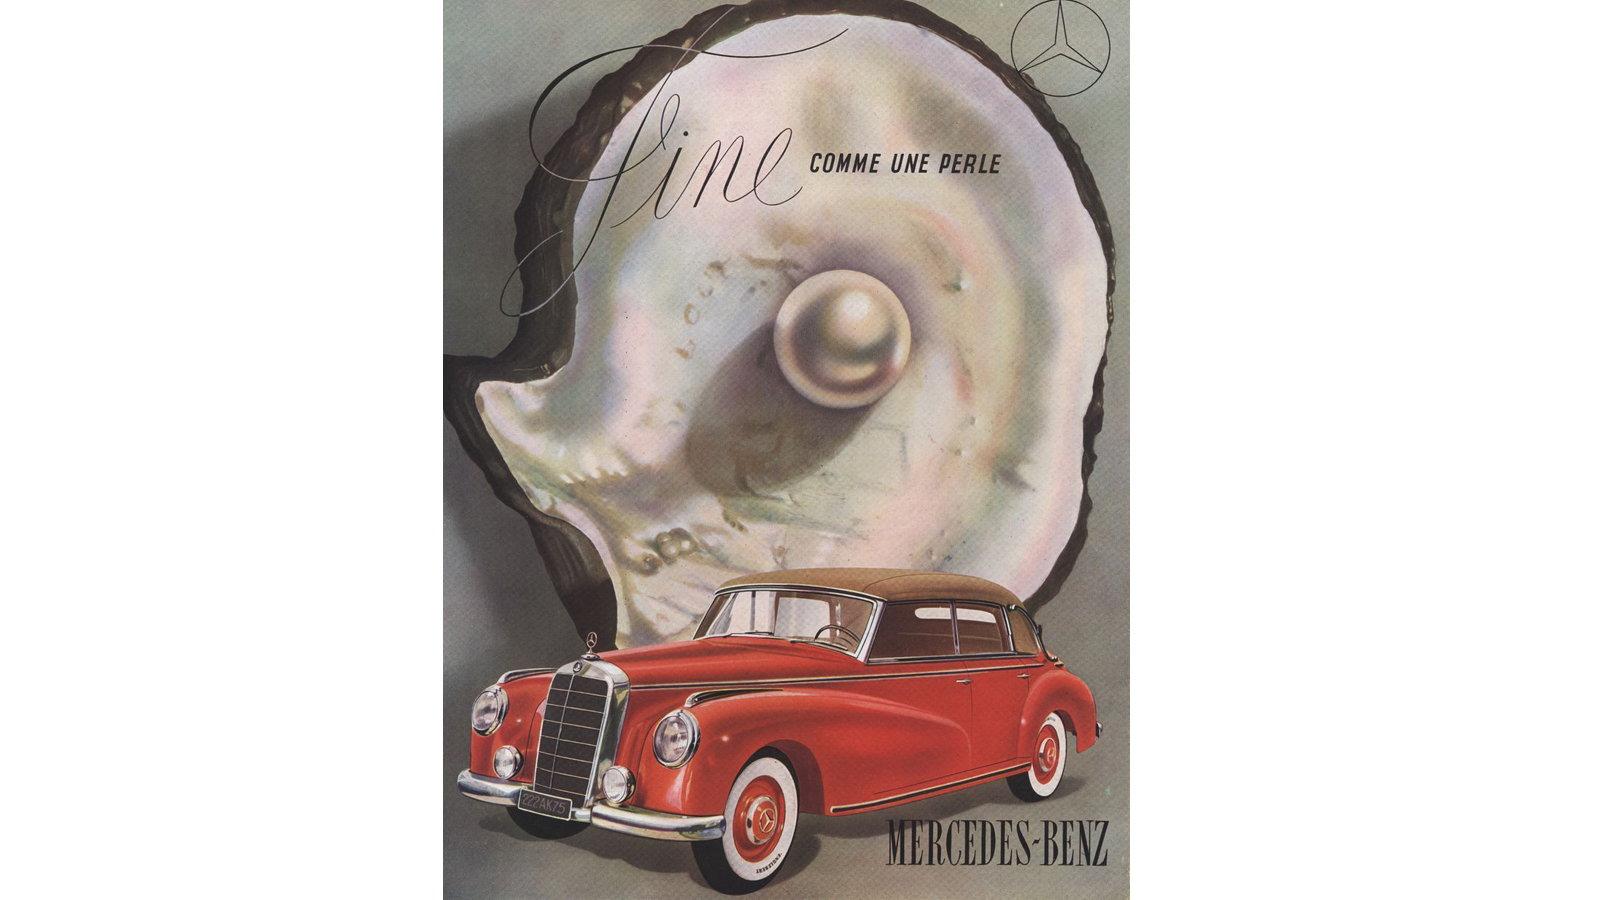 Fine as a Pearl